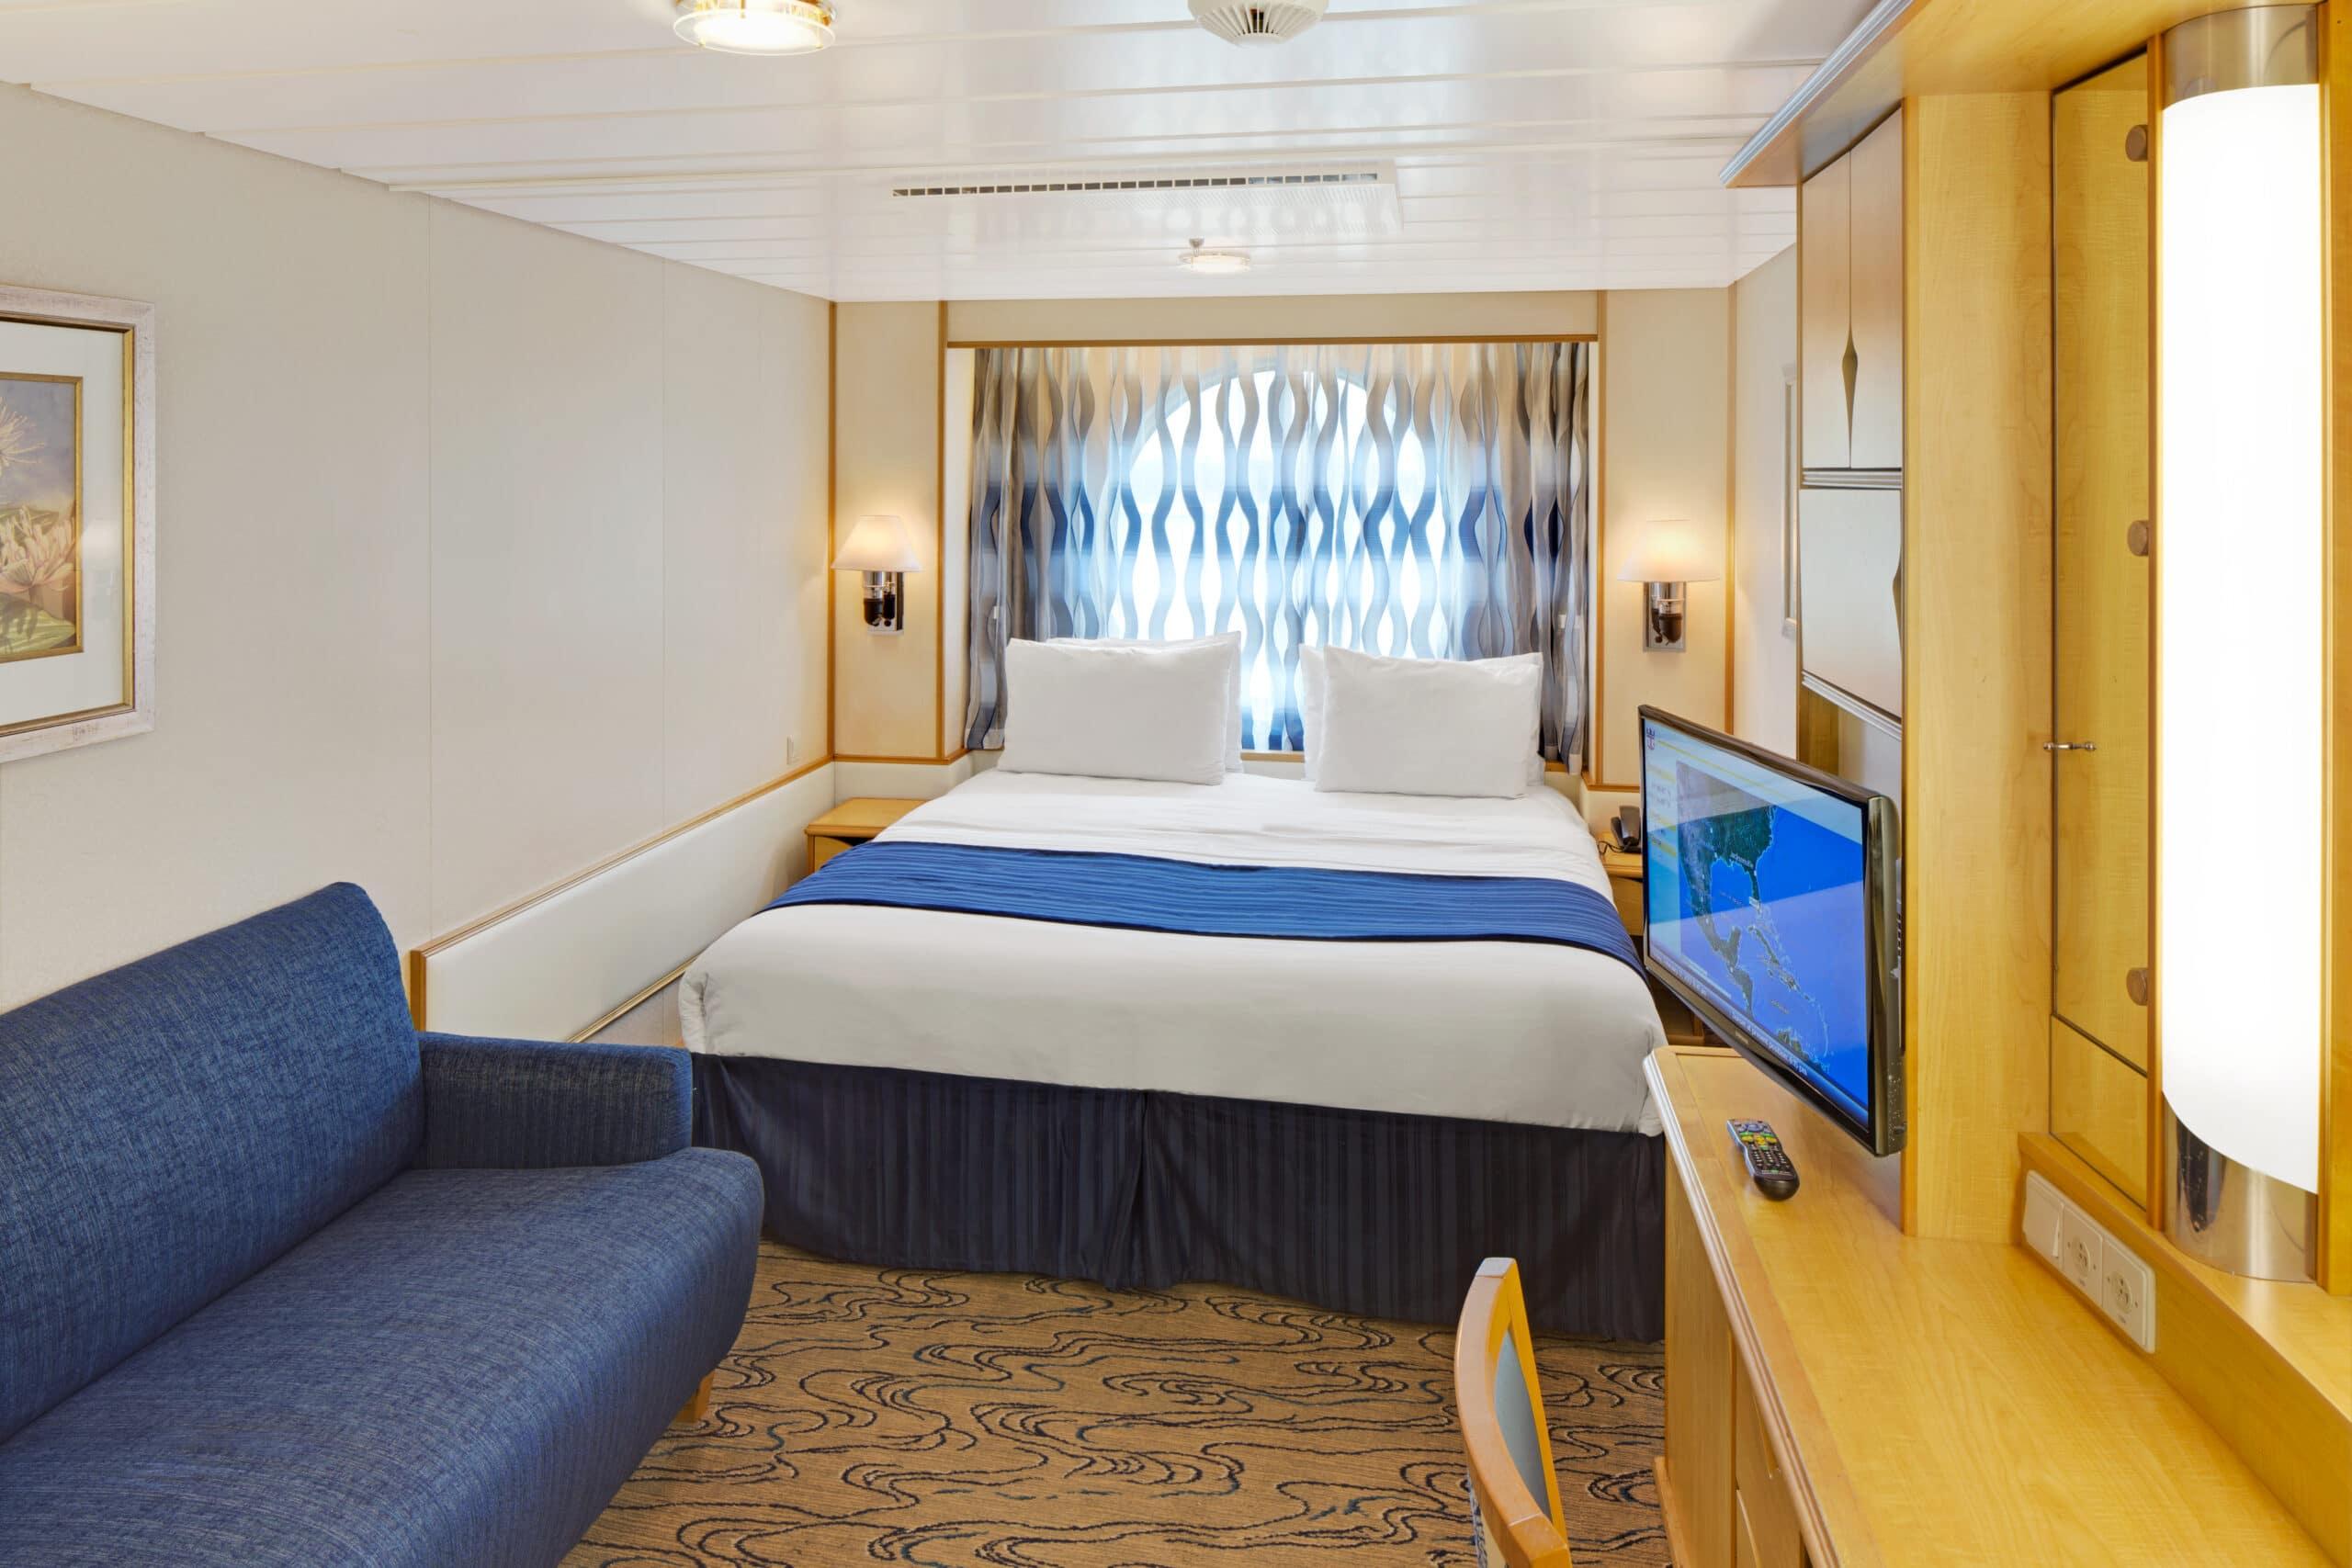 Royal-Caribbean-International-Navigator-Voyager-of-the-Seas-schip-cruiseschip-categorie-1N-2N-3N-8N-buitenhut